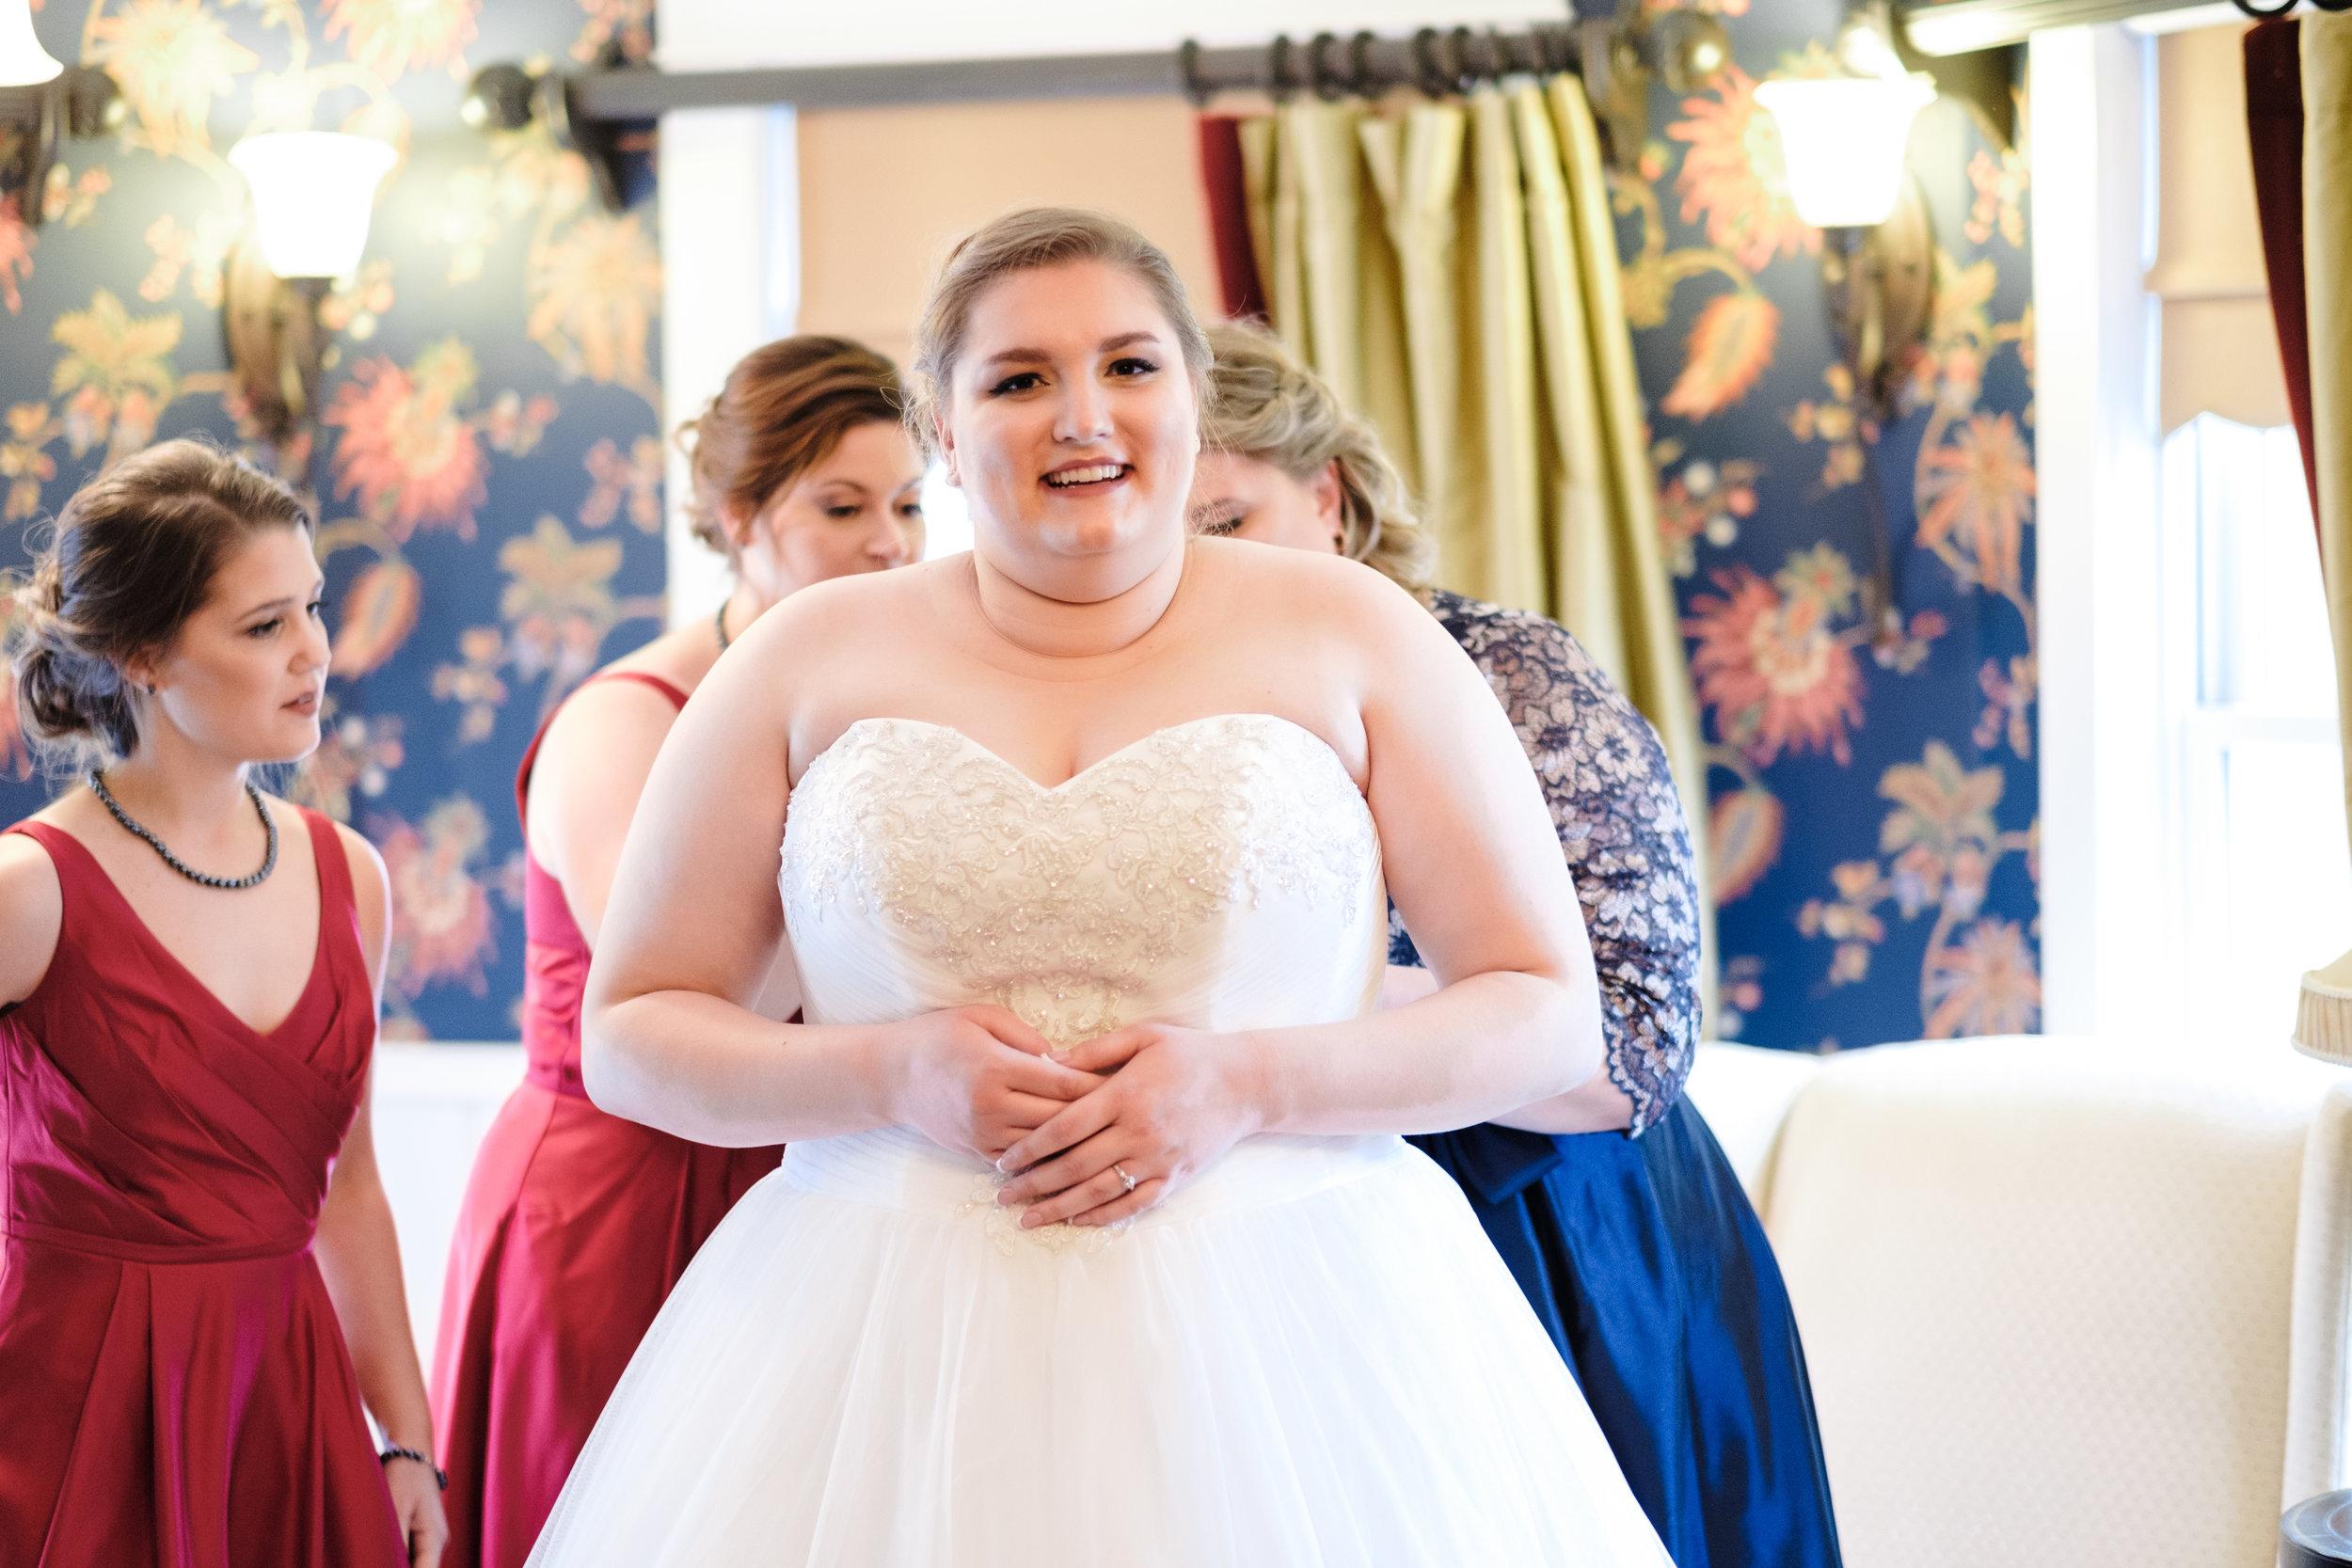 18-12-28 Corinne-Henry-Pavilion-Wedding-47.jpg